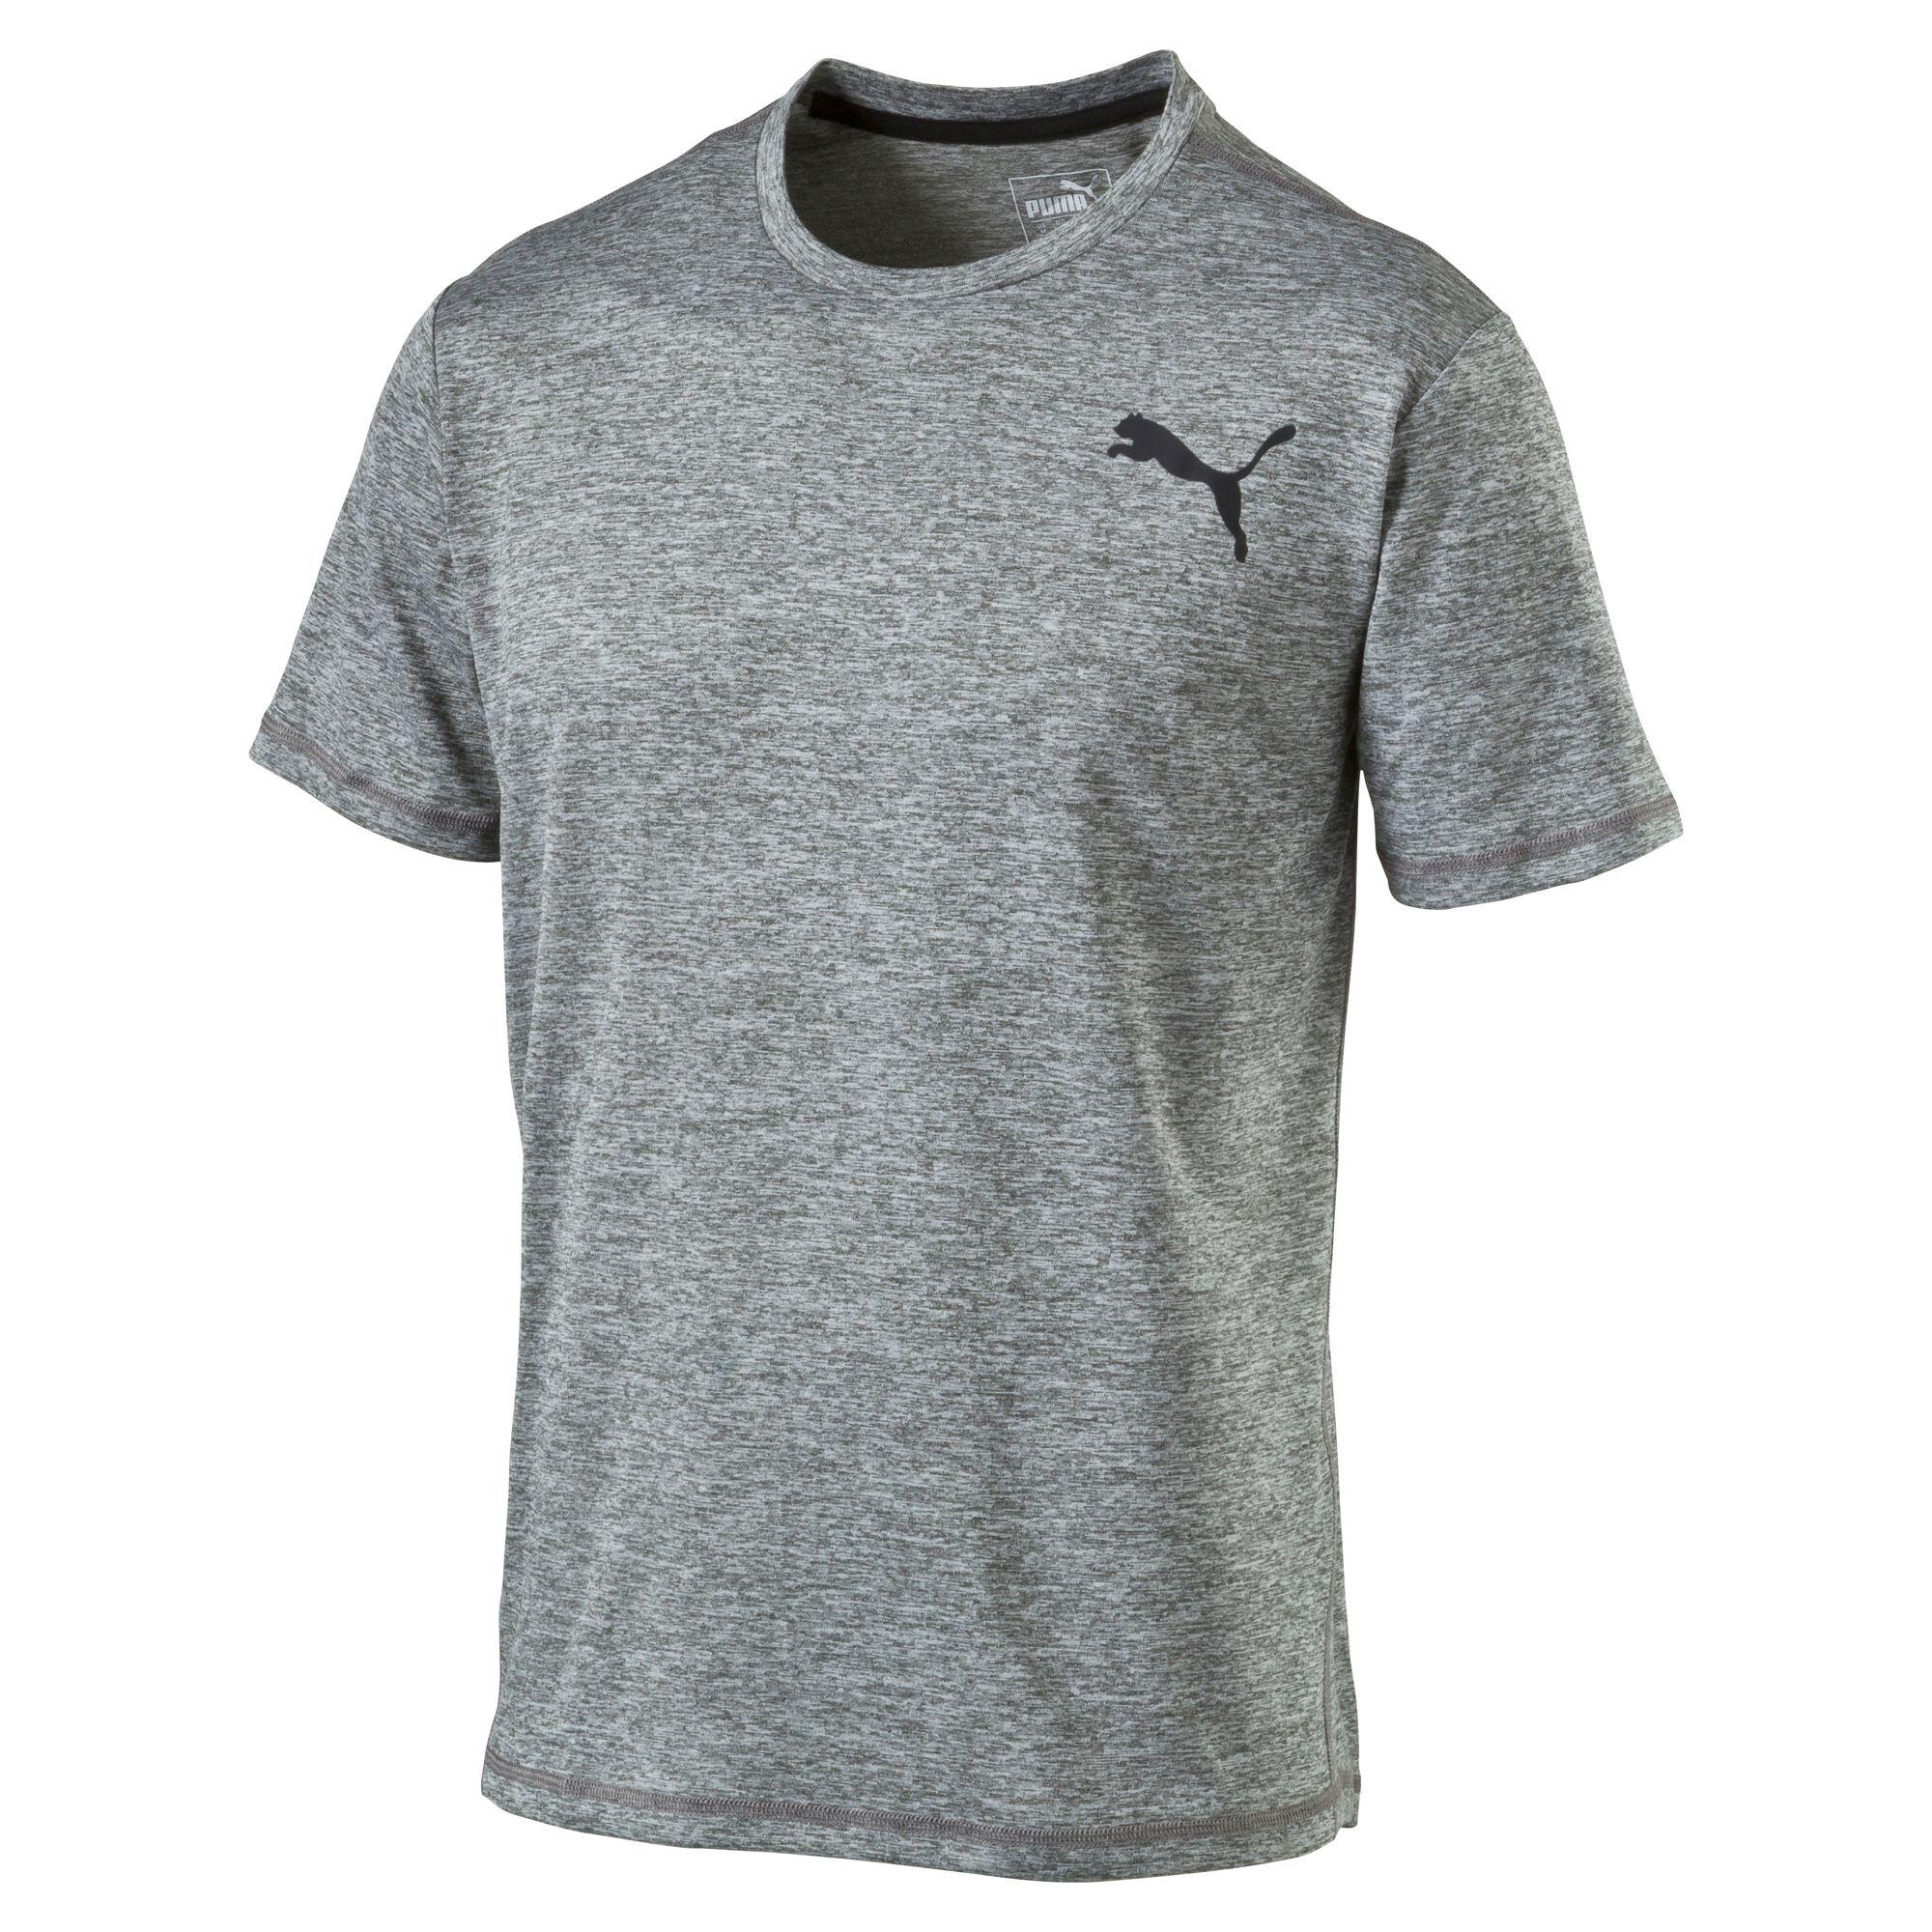 Image Puma Men's Training Essential Puretech Heather T-Shirt #1